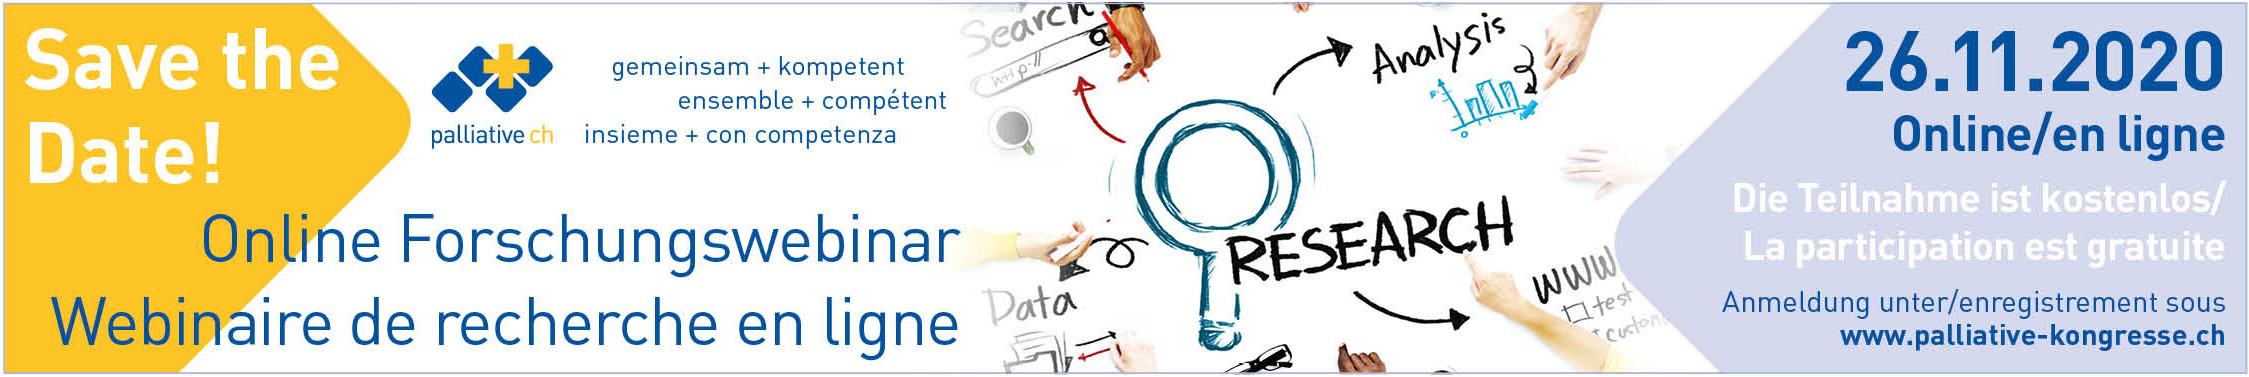 palliative ch: Online Forschungswebinar